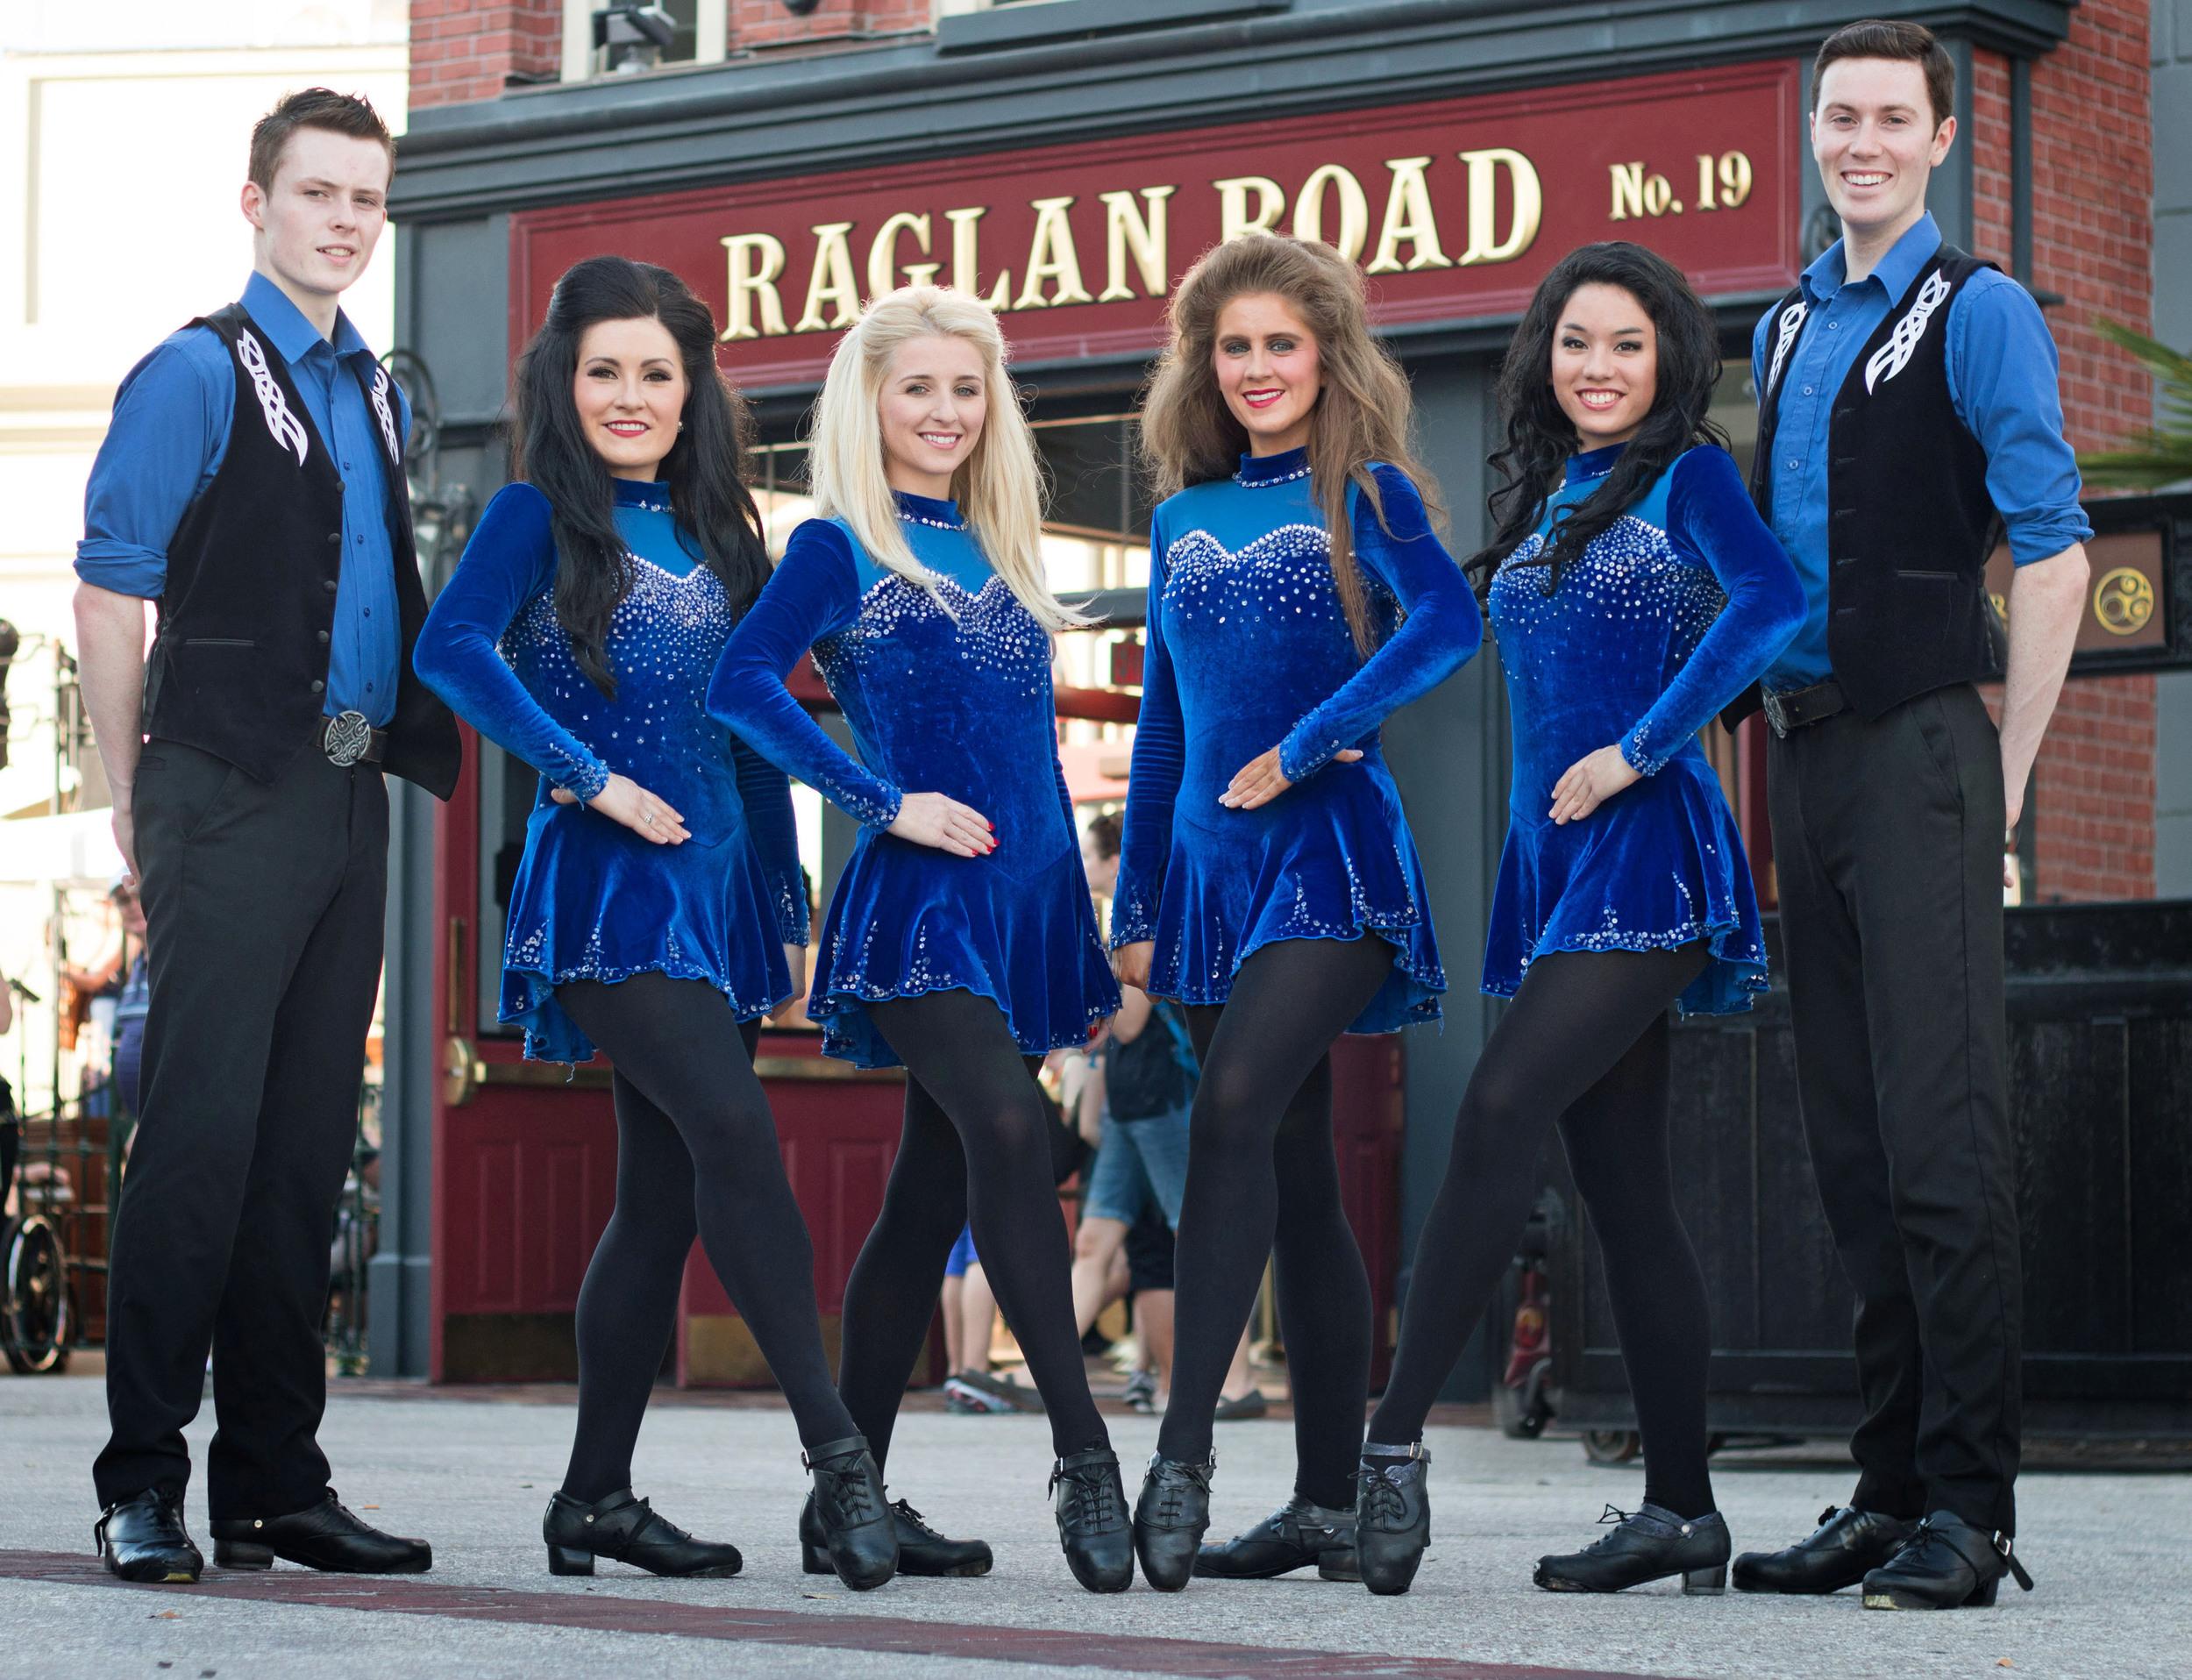 The Raglan Road Irish Dancers.